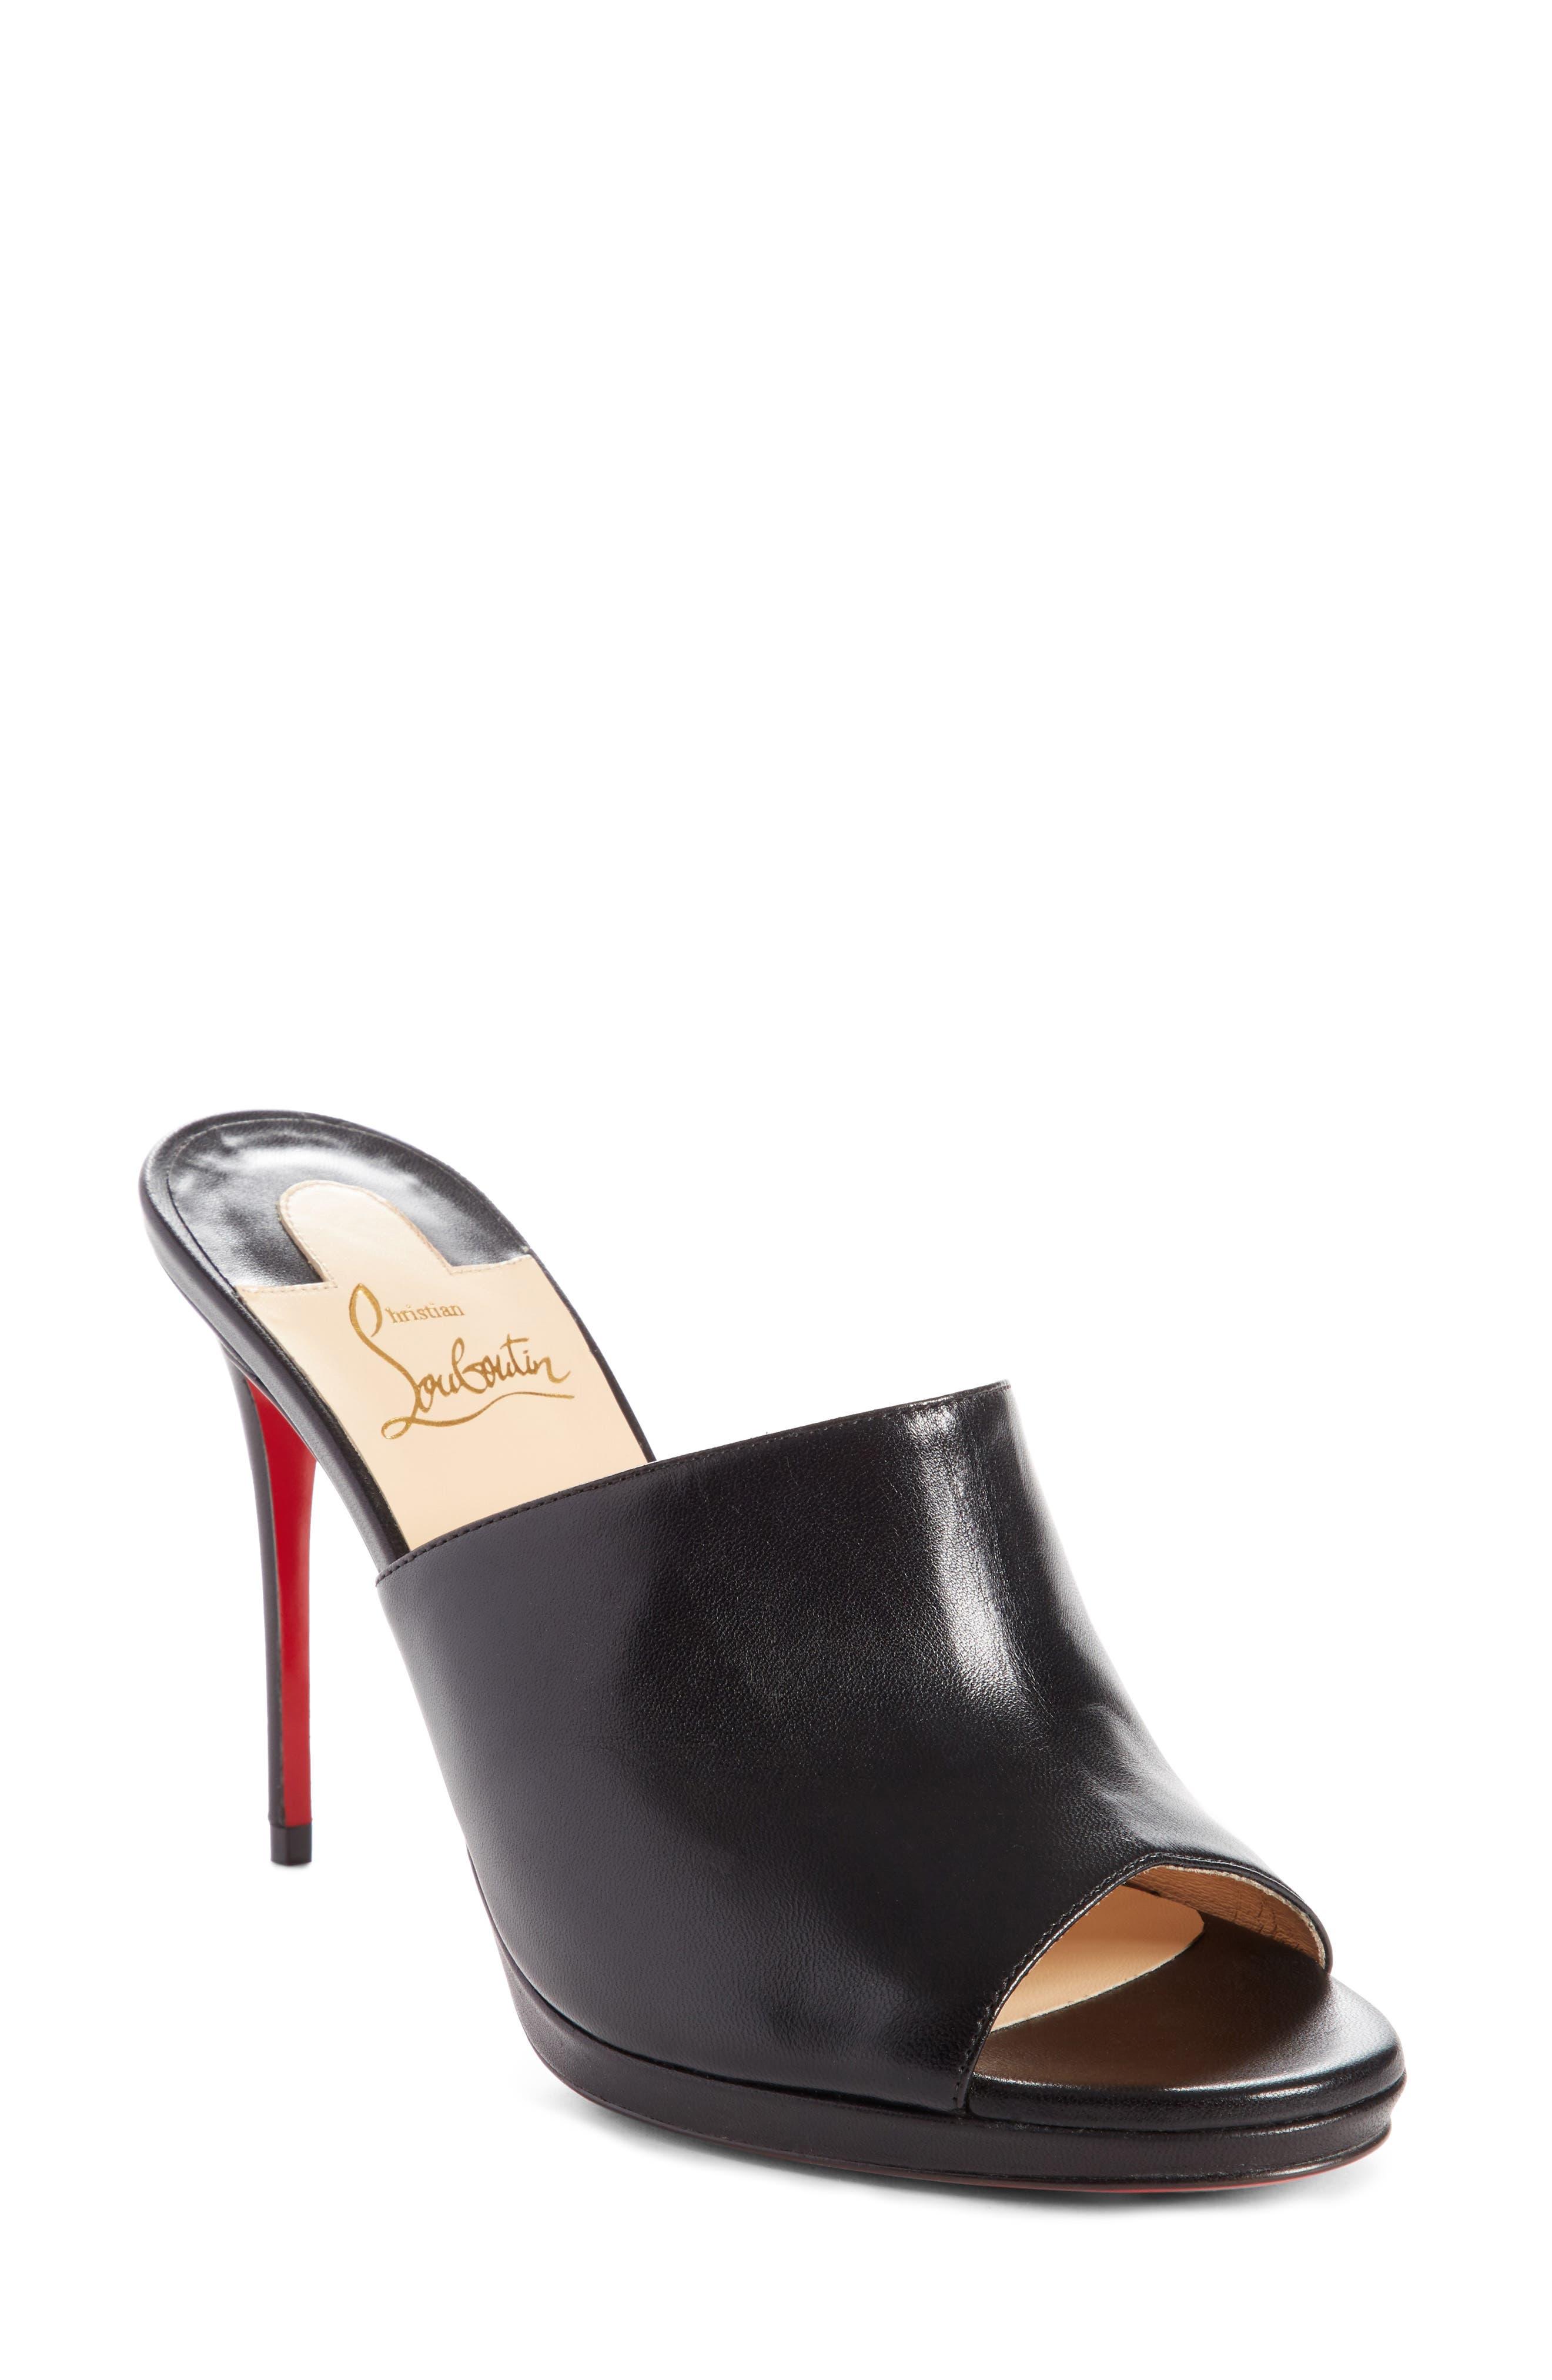 Pigamule Sandal,                         Main,                         color, BLACK